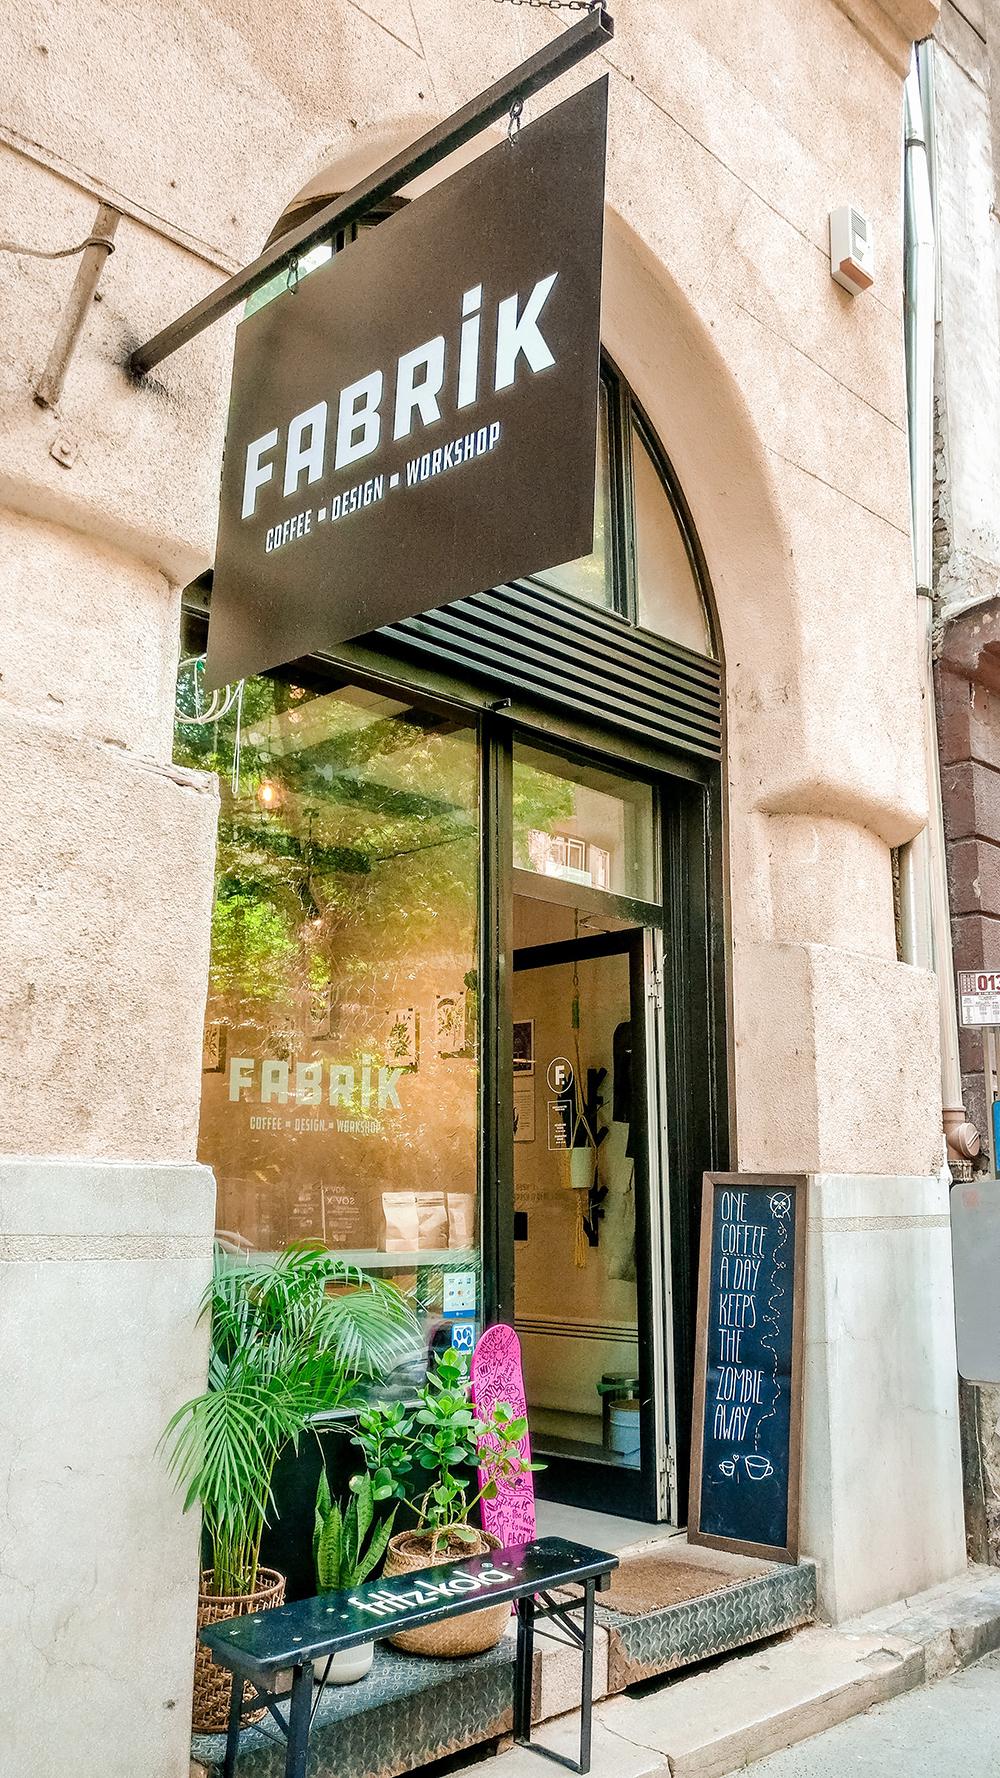 Fabrik Specialty Coffee - Design - Workshop - Budapest's best breakfast & brunch places - Jászai Mari square and Pozsonyi street | Aliz's Wonderland